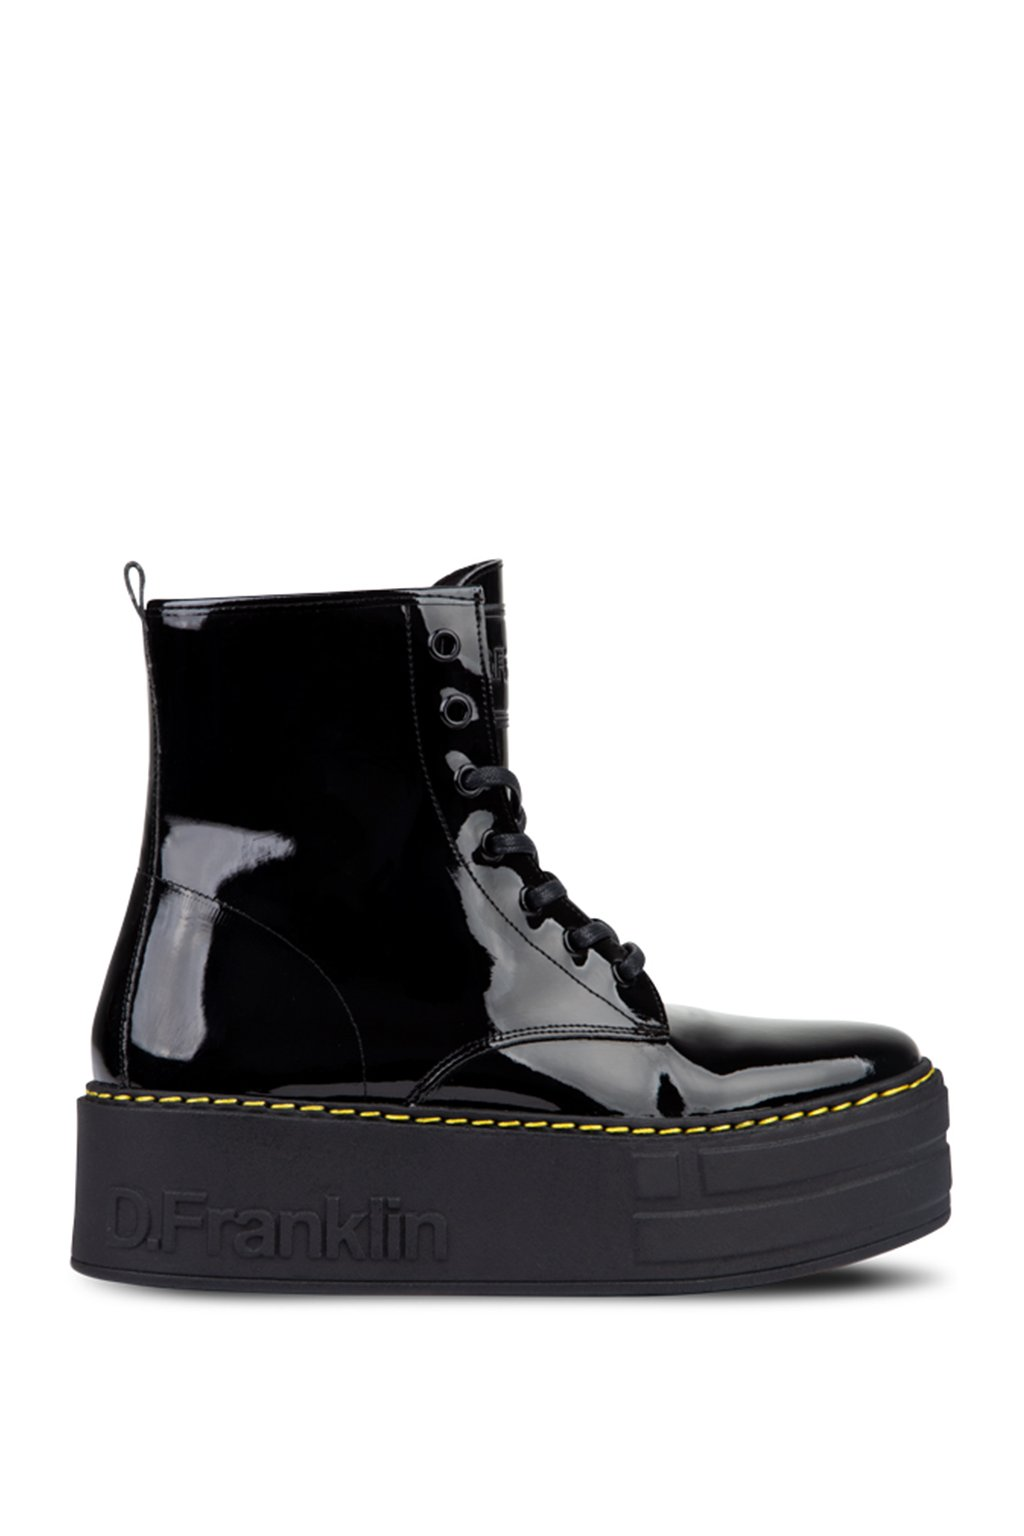 cerne snerovaci boty na platforme dfranklin